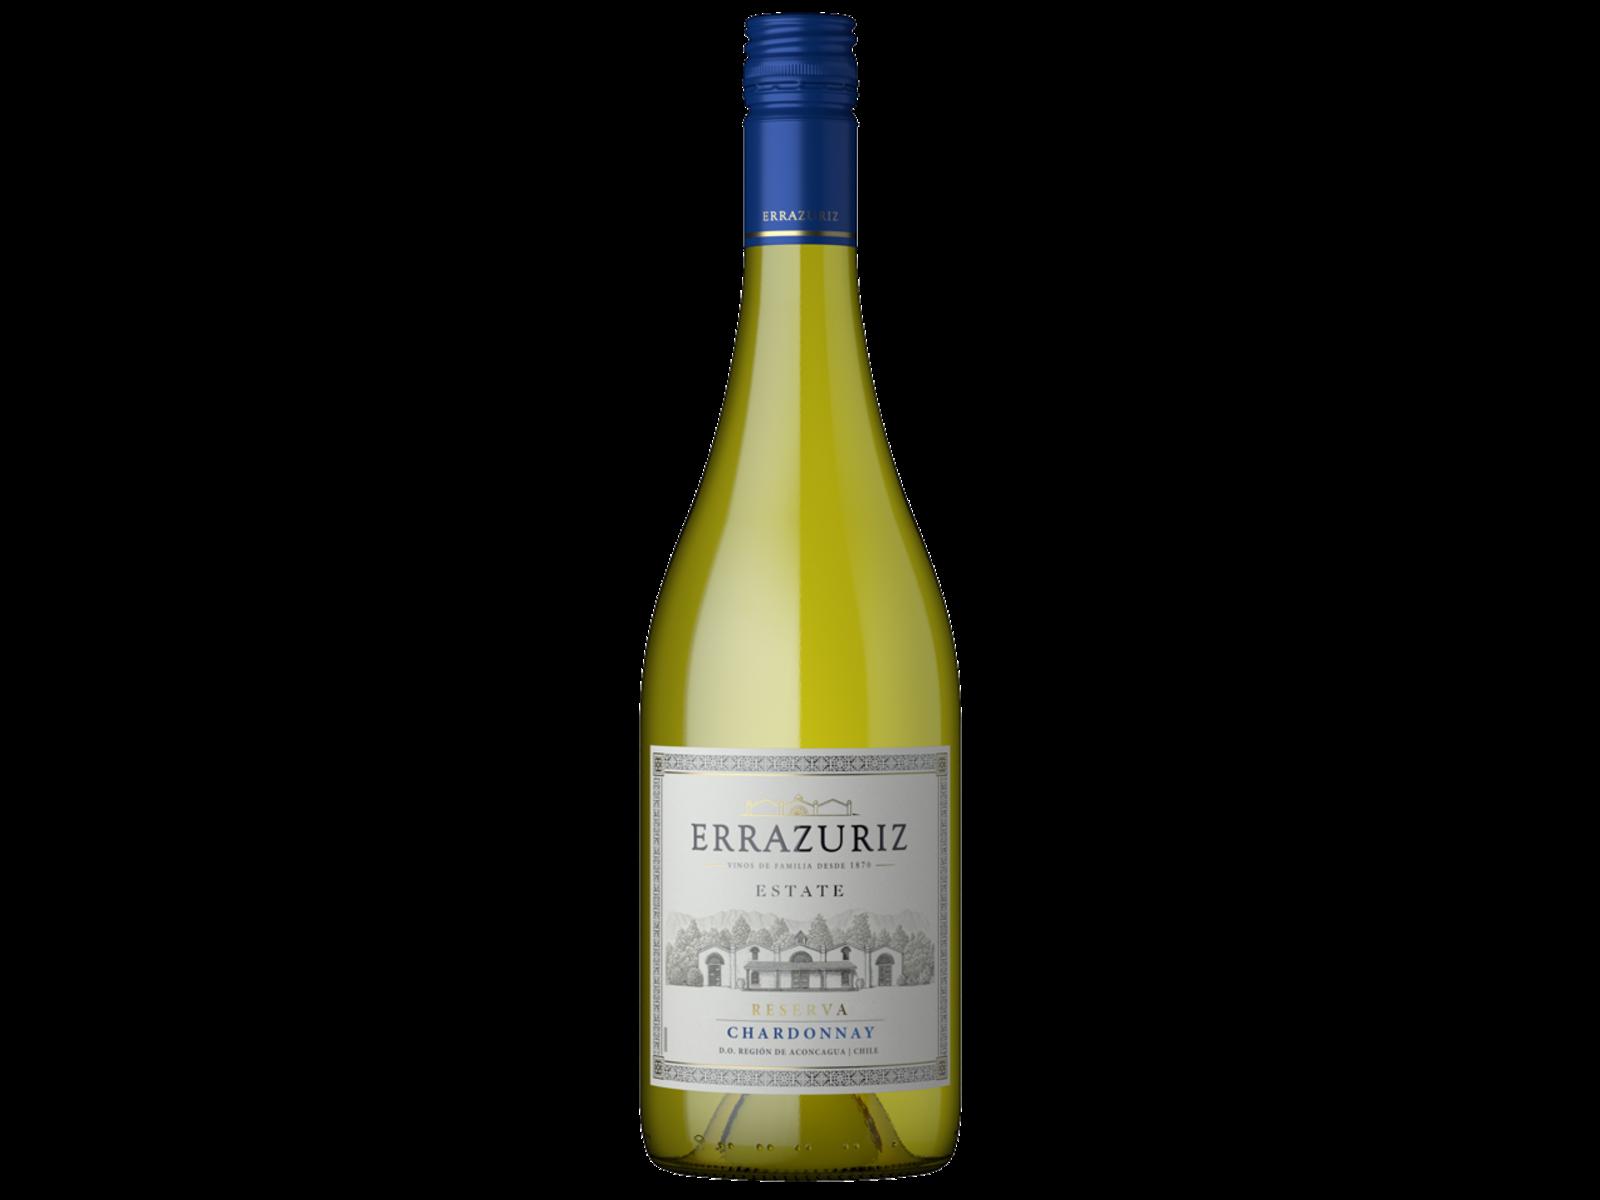 Viña Errázuriz Errazuriz / Max Reserva / Chardonnay